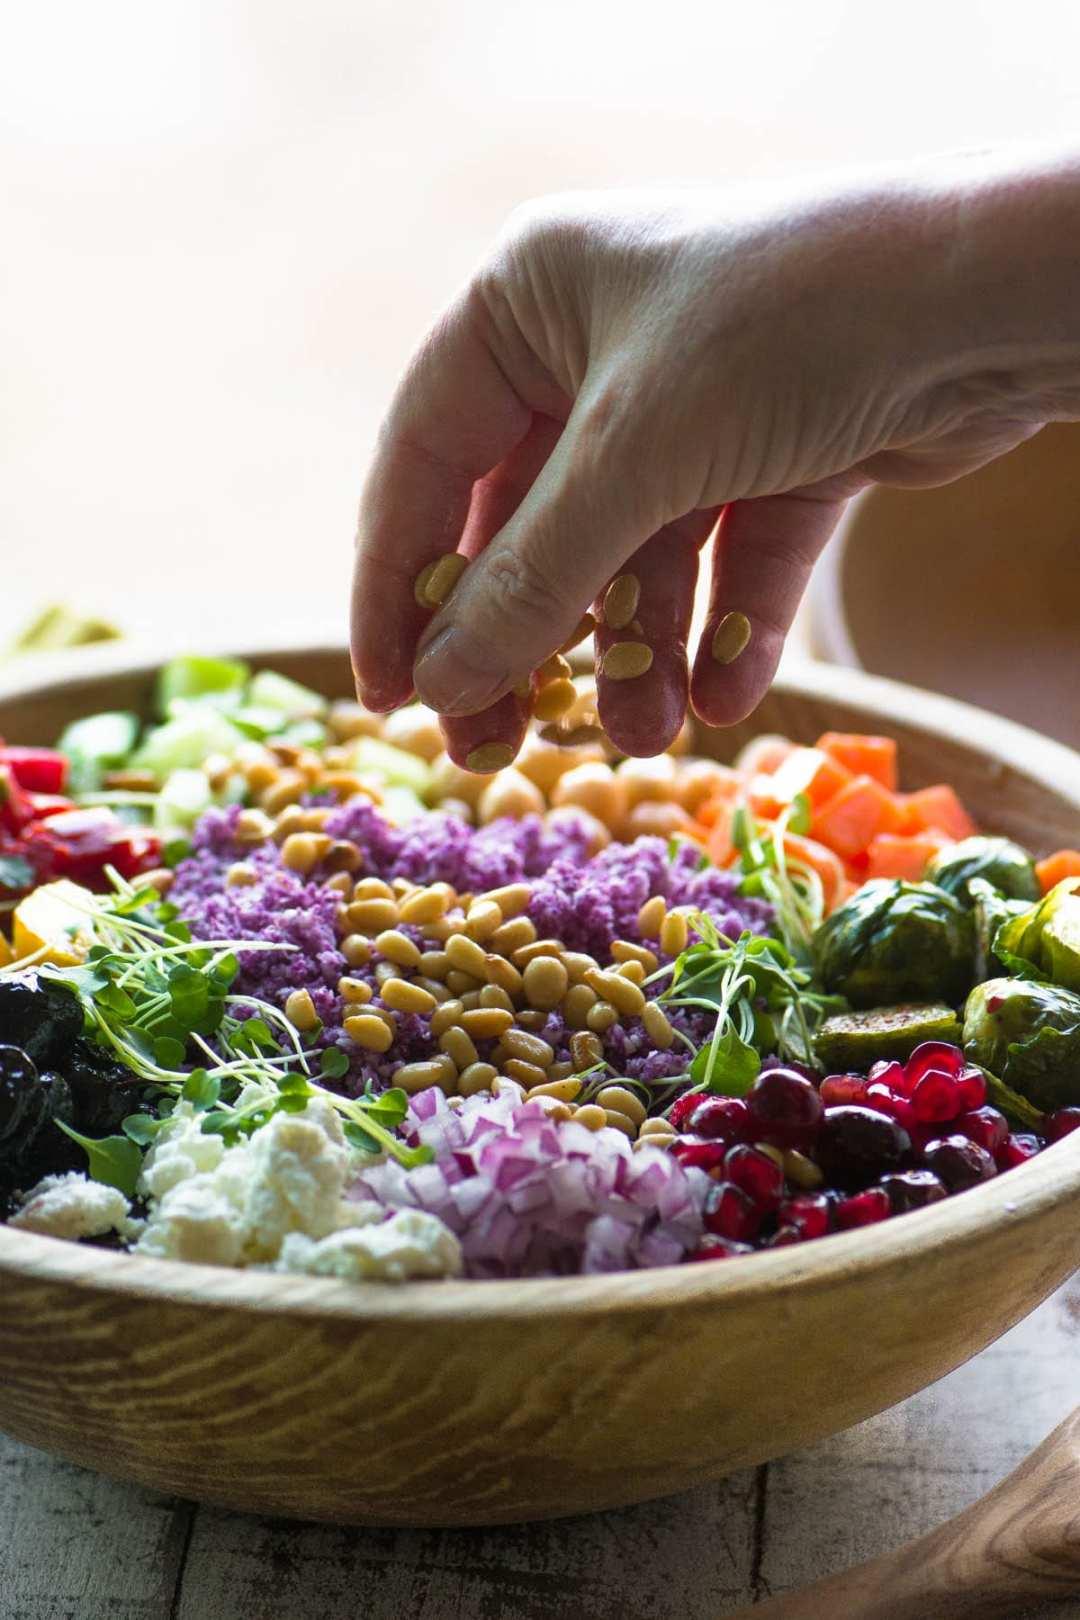 Sprinkling pine nuts onto a purple cauliflower rice salad